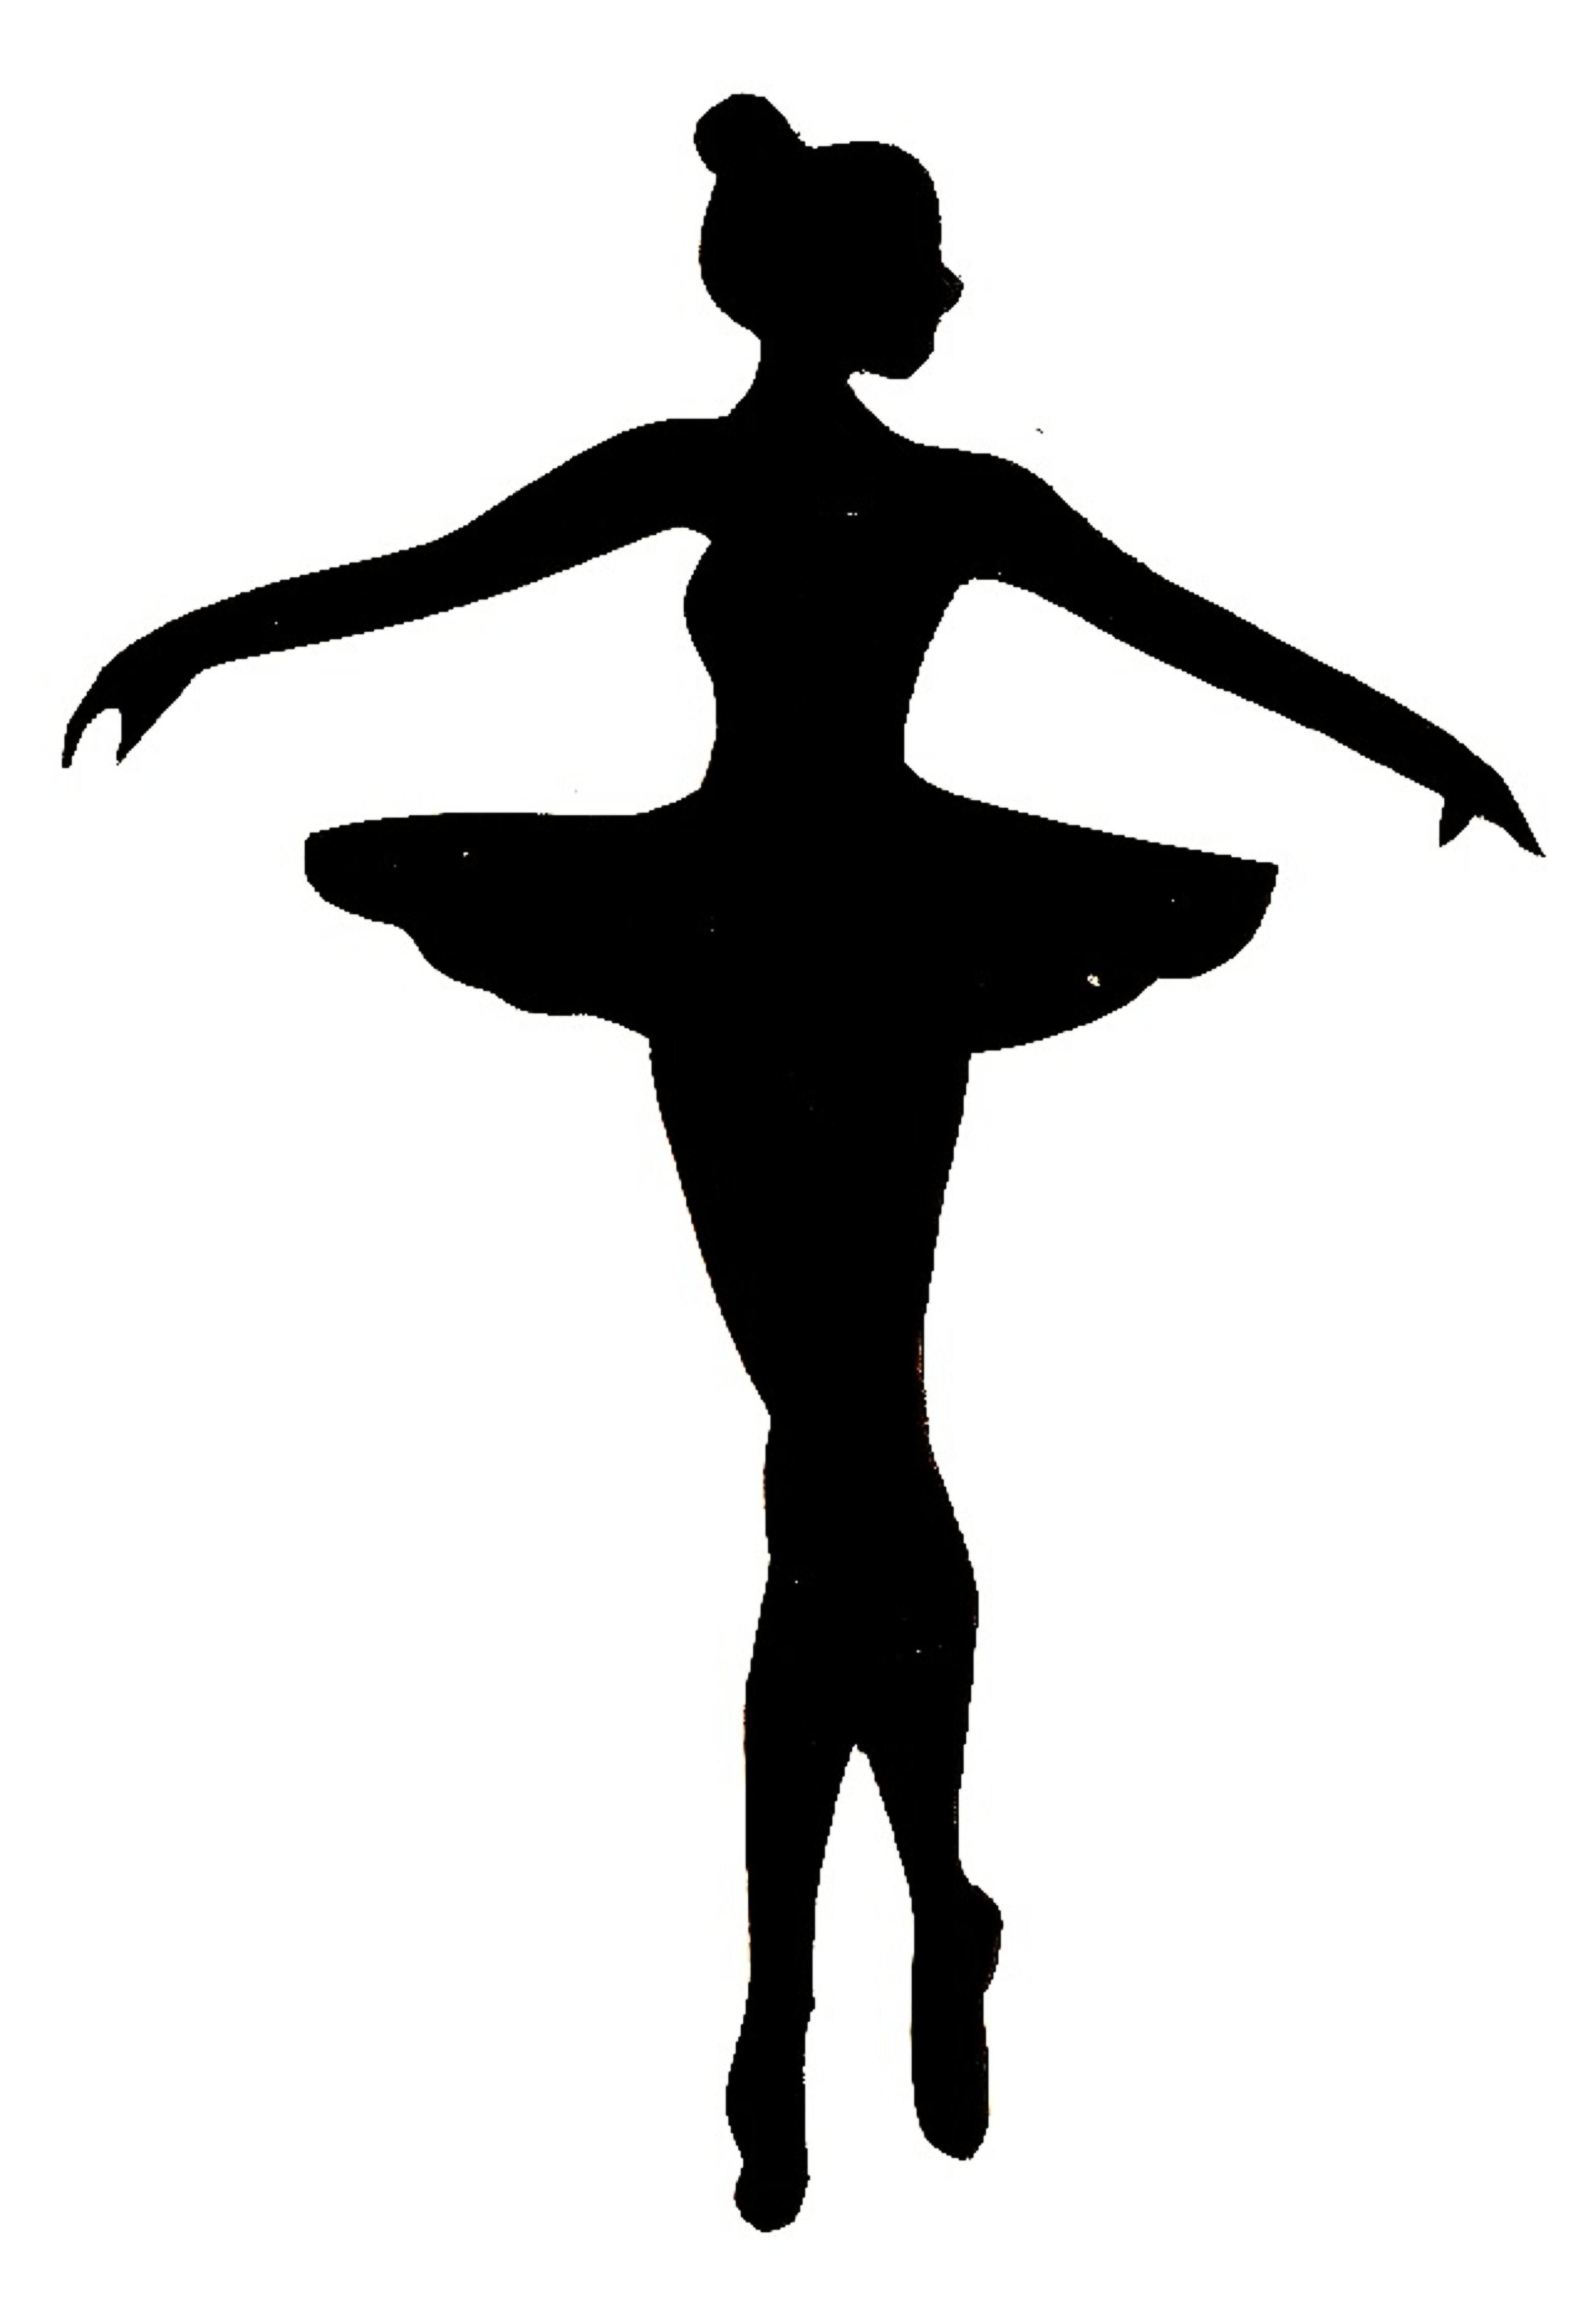 Ballerina clipart black and white. Pencil in color